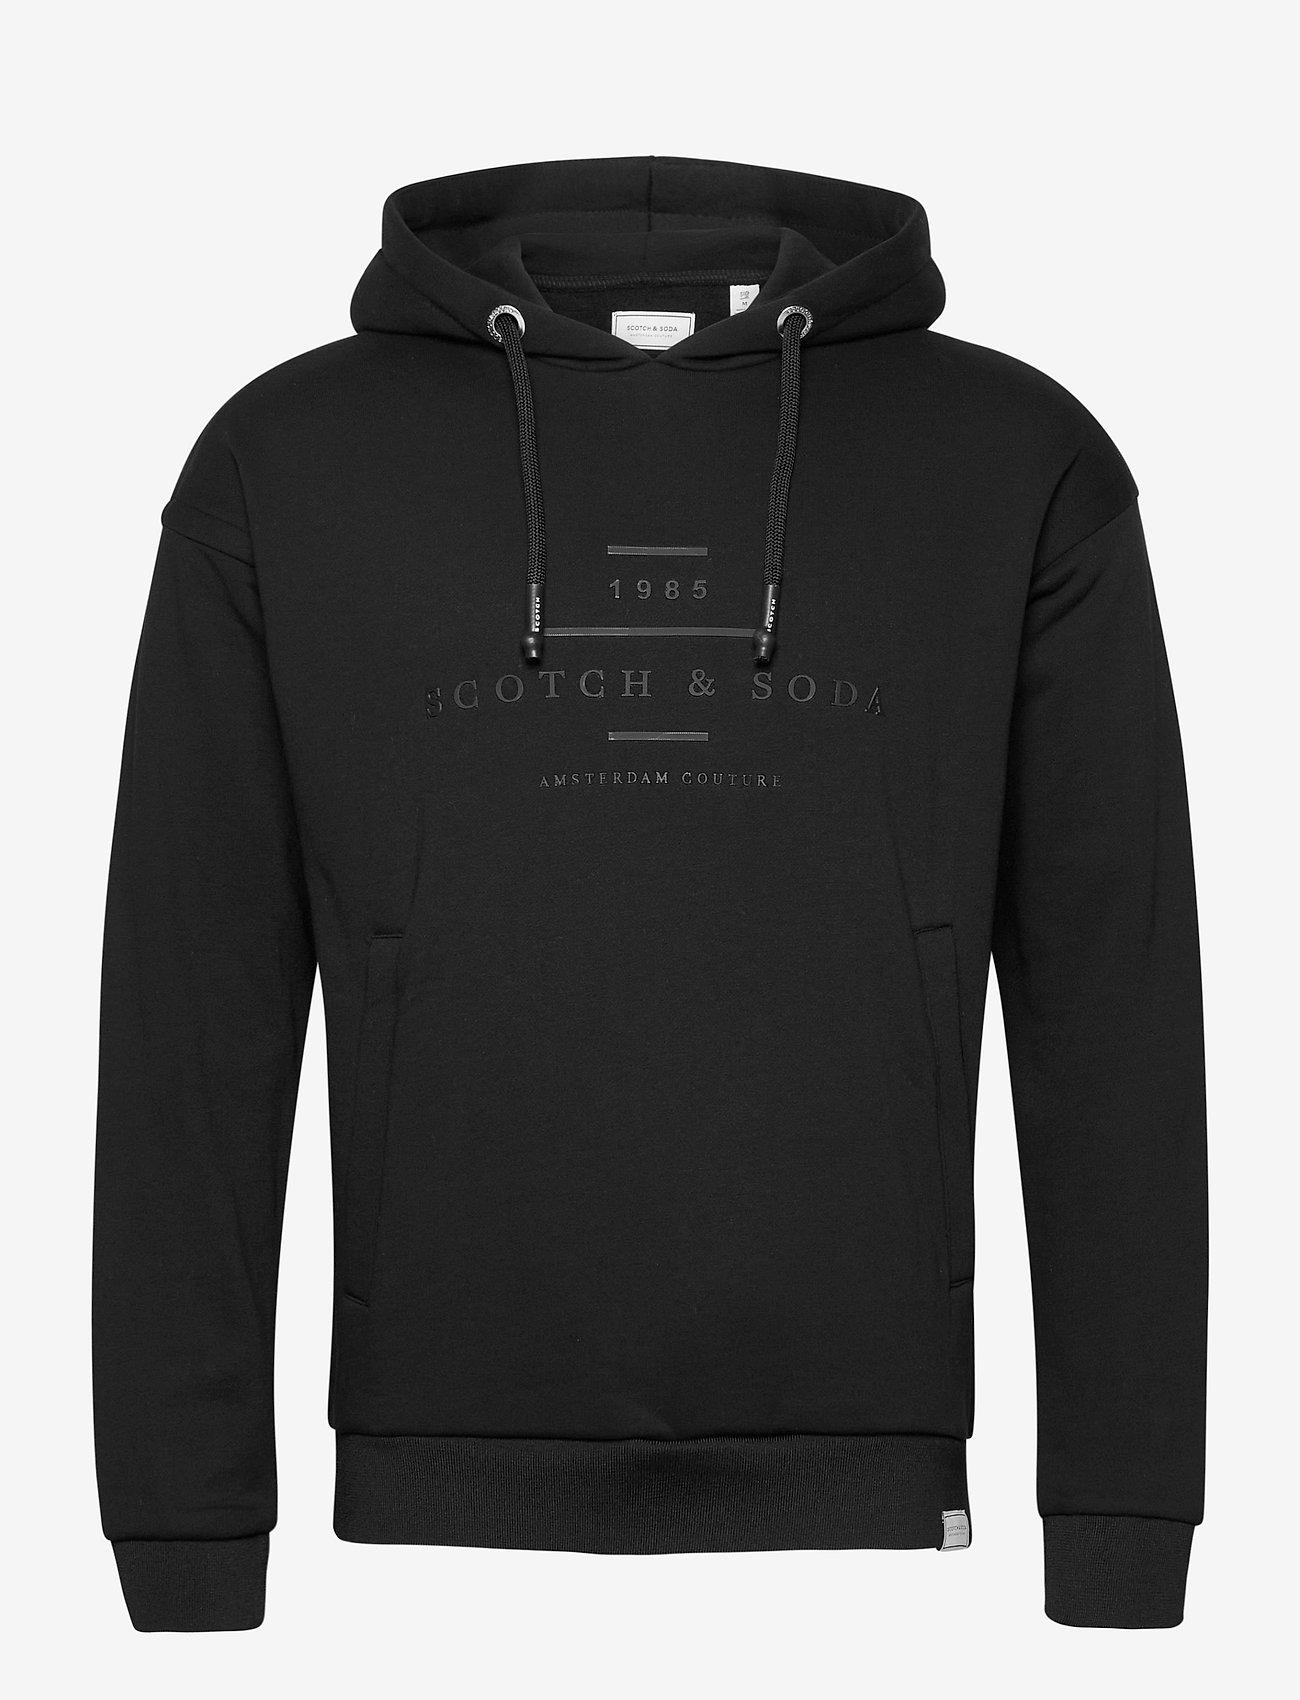 Scotch & Soda - Scotch & Soda hooded sweat - hoodies - black - 0